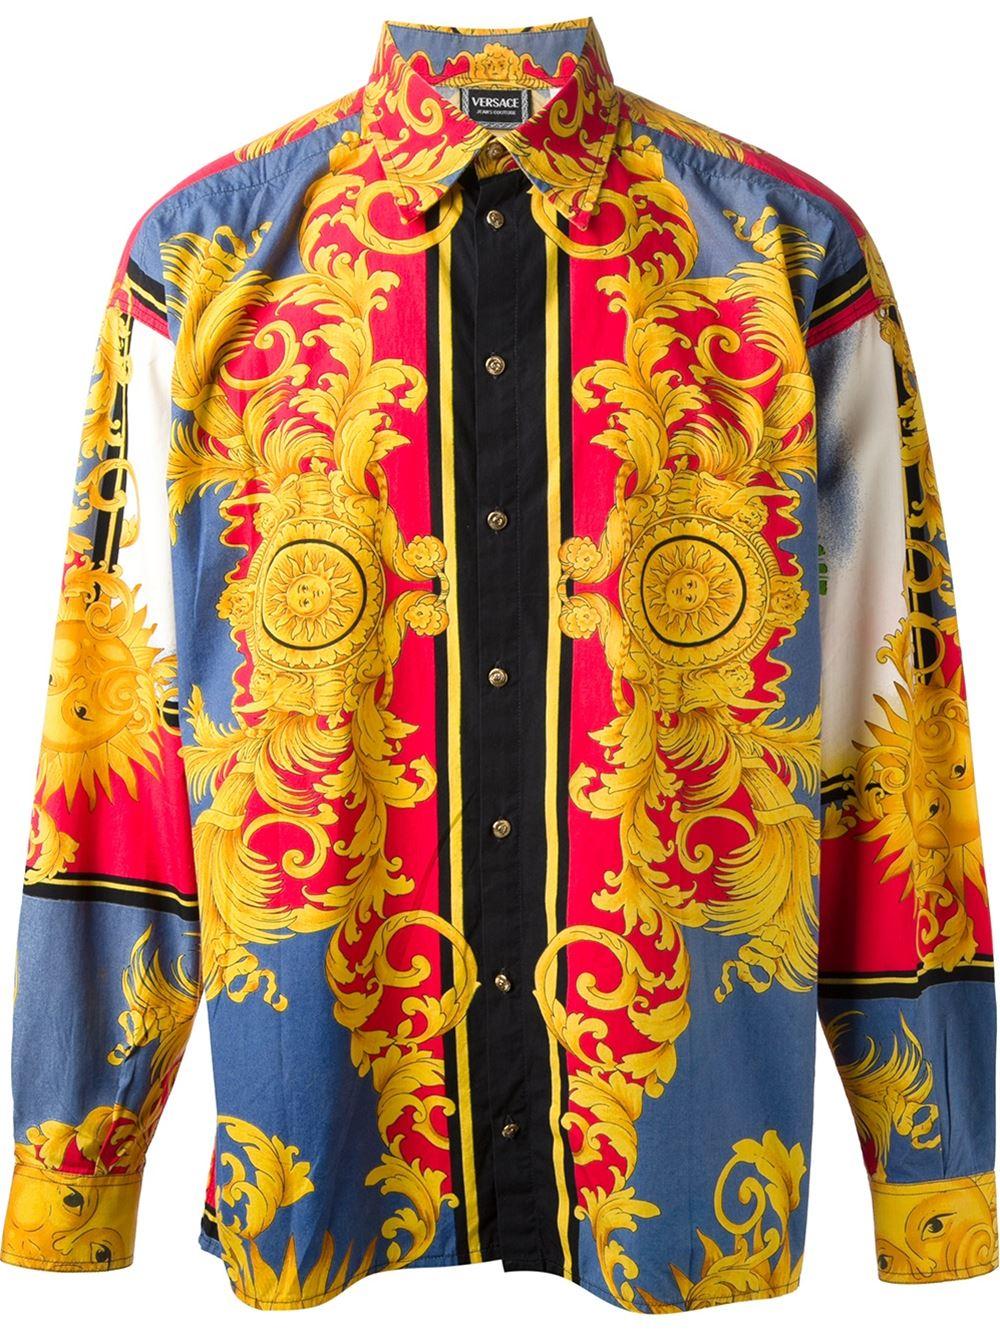 the gallery for vintage versace shirts for men. Black Bedroom Furniture Sets. Home Design Ideas